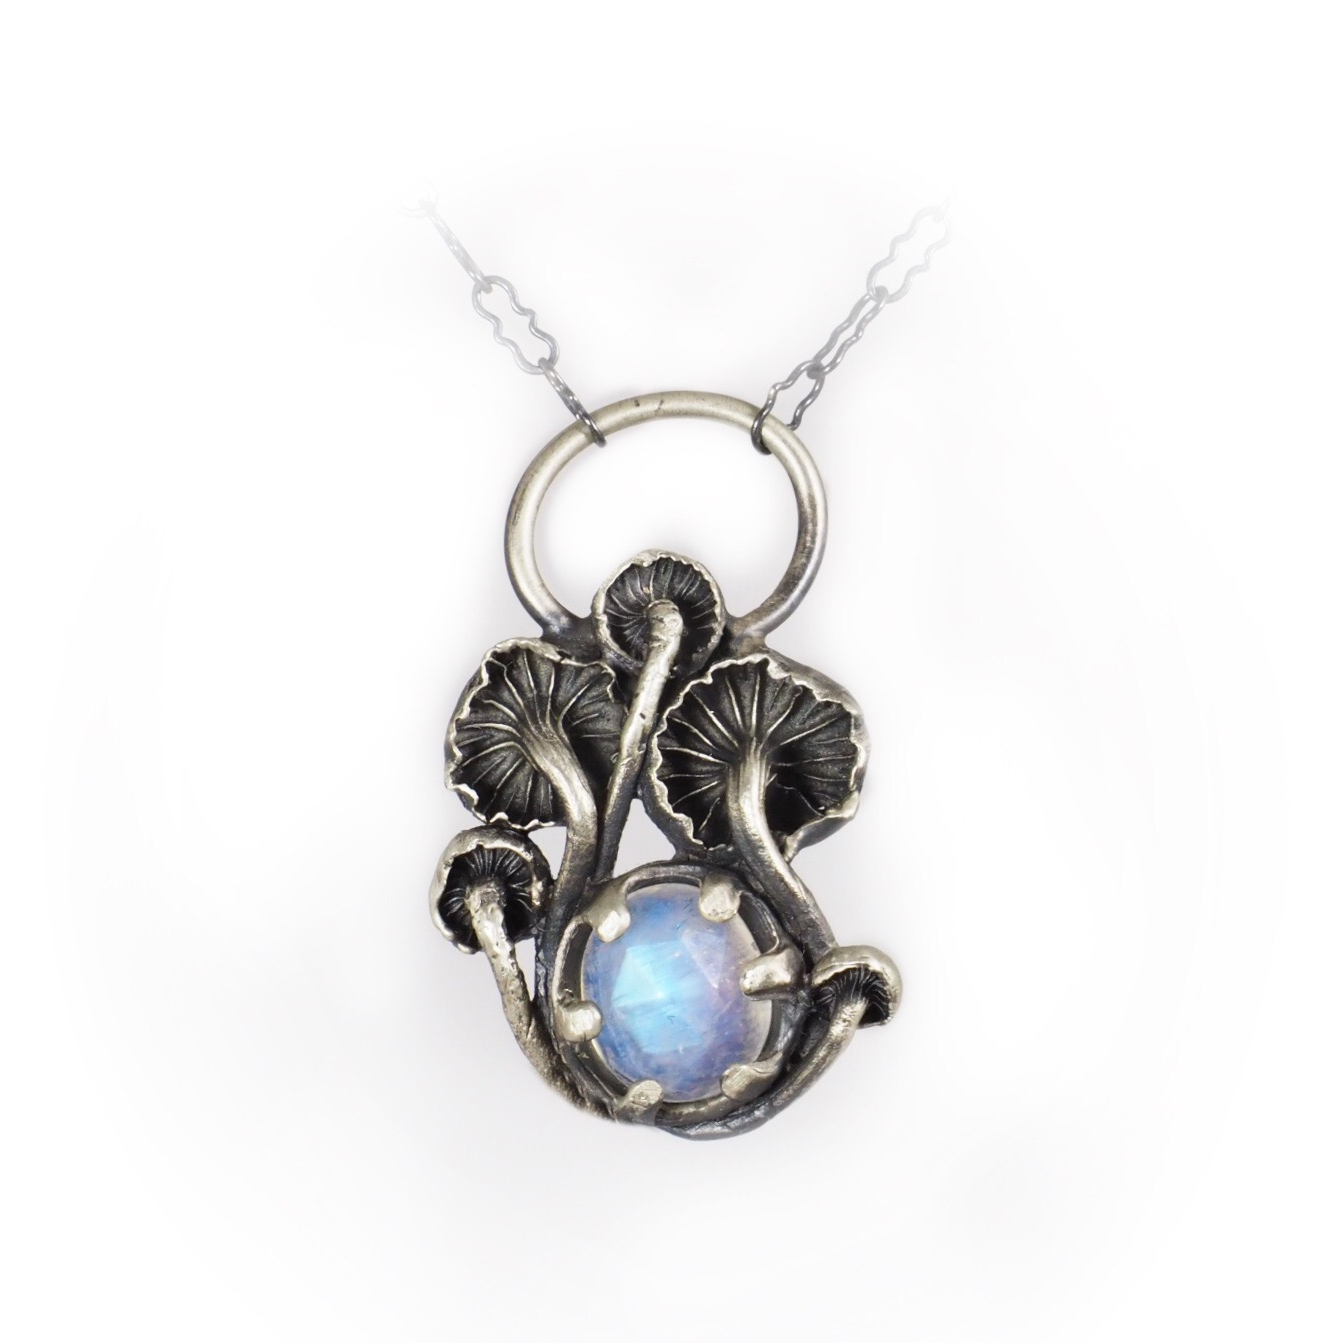 Mushroom Stone Necklace